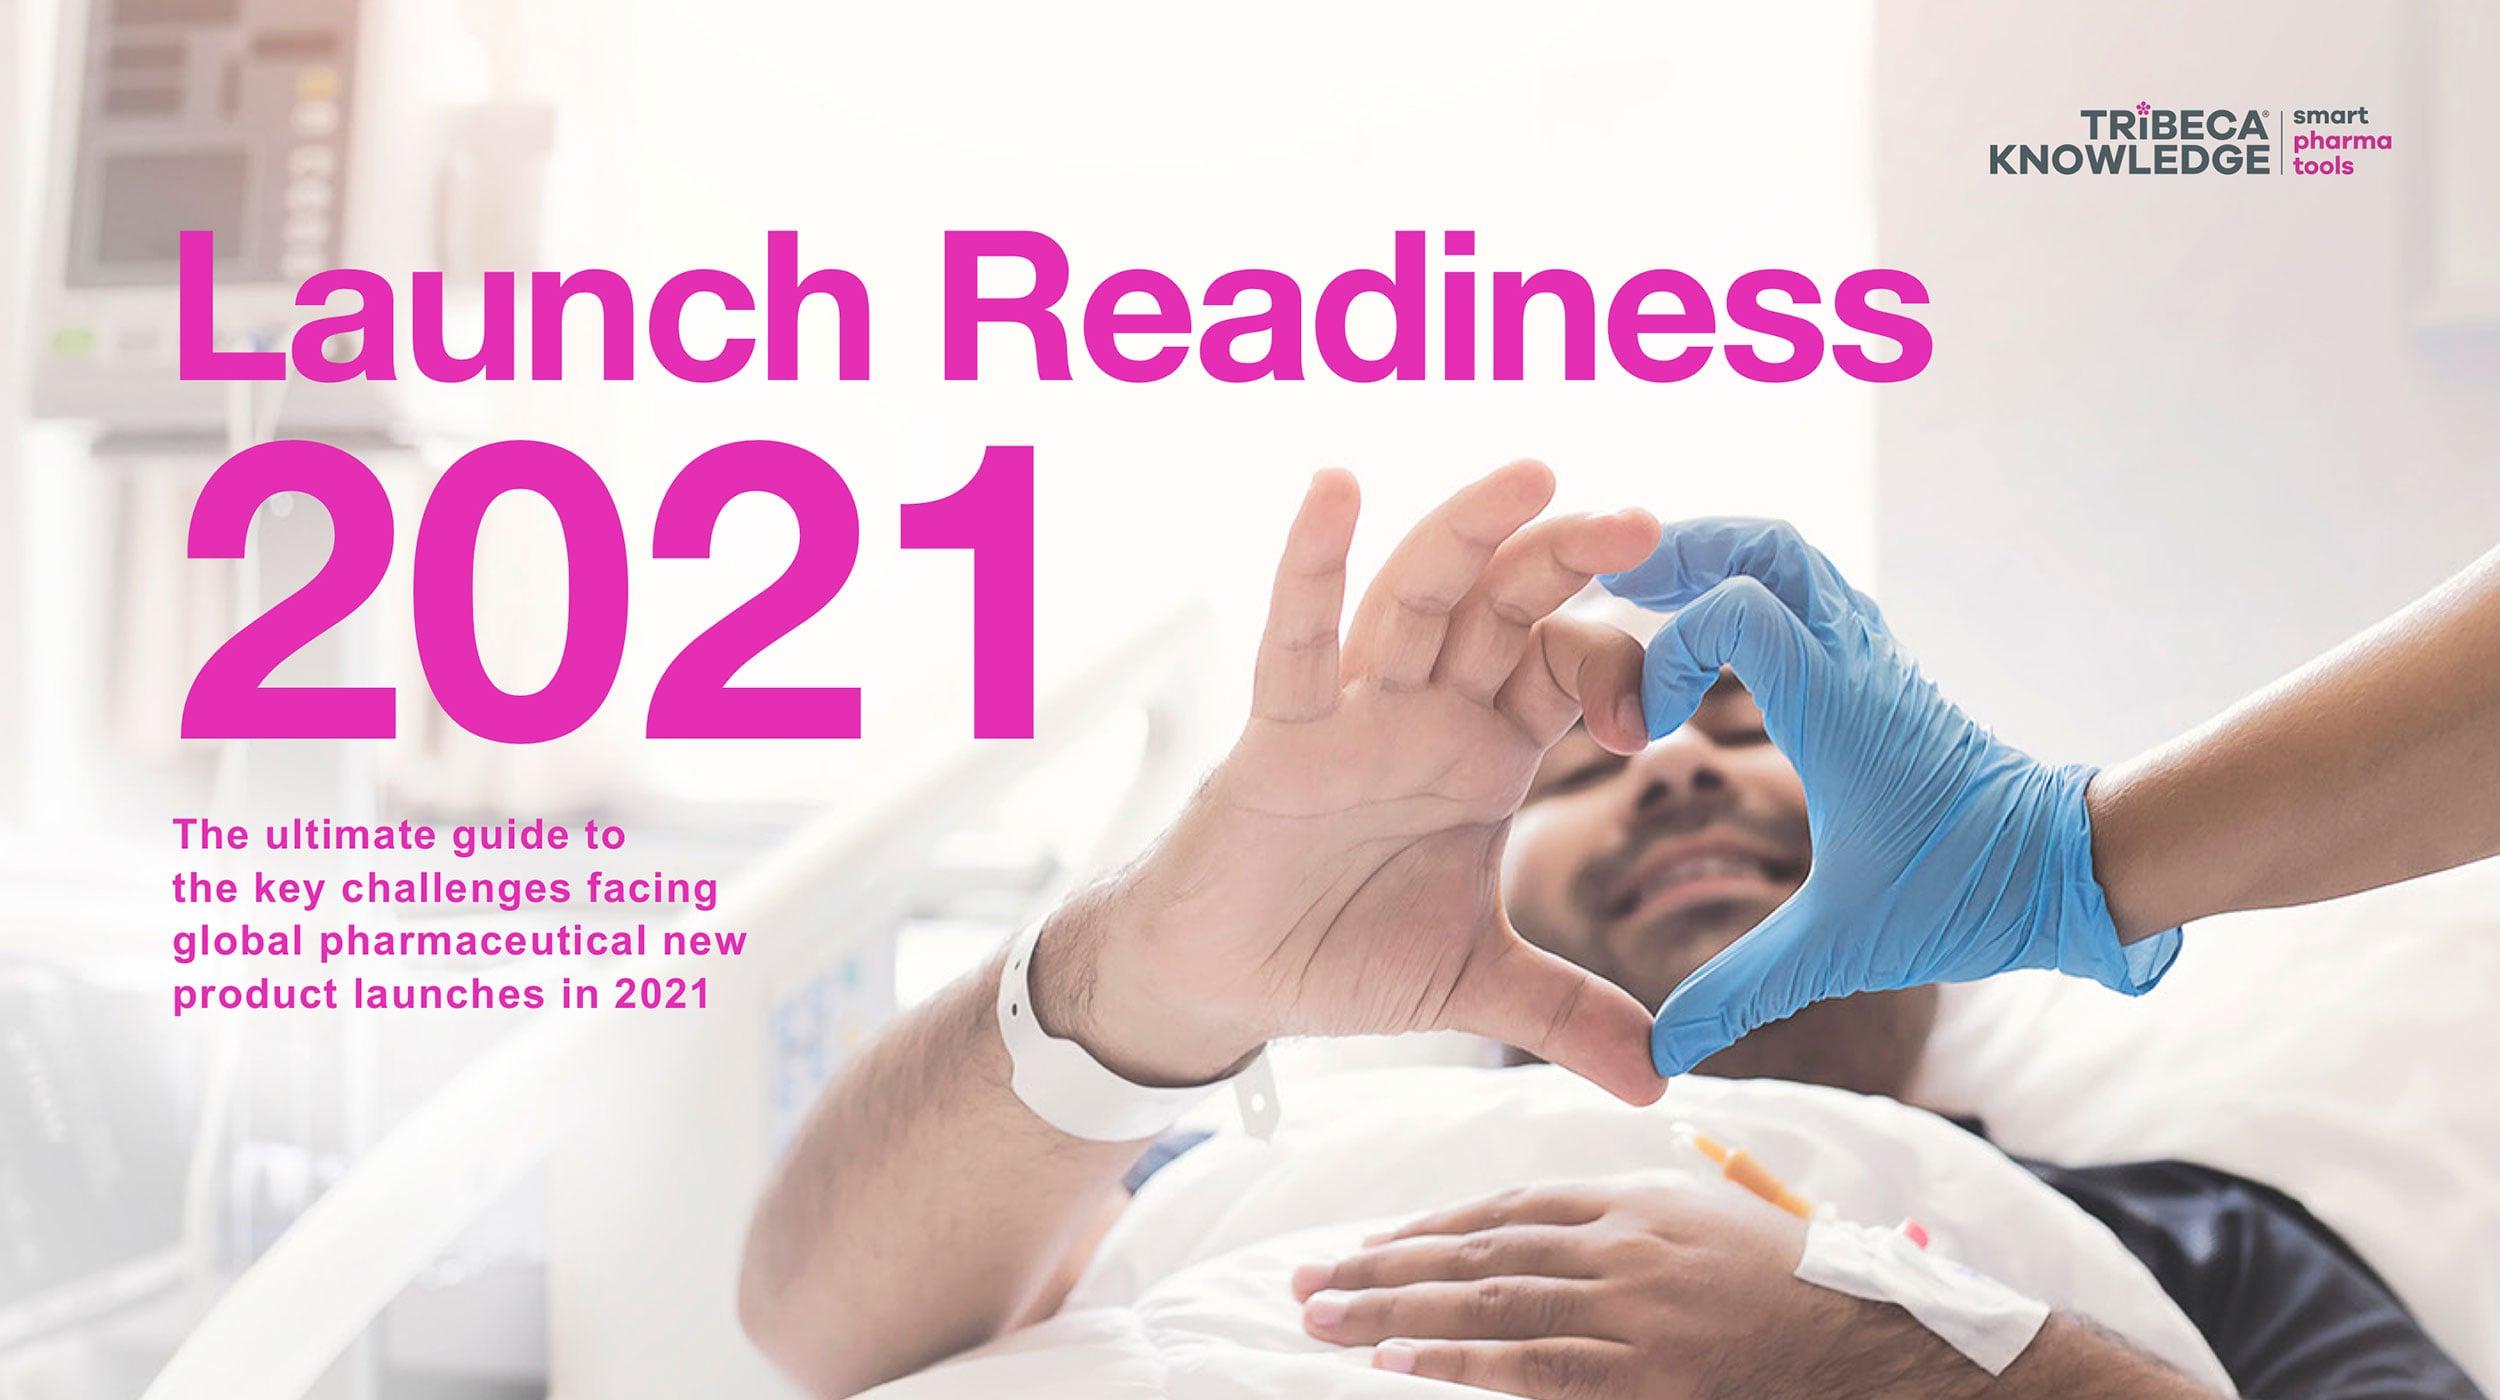 TRiBECA-Launch-Readiness-2021